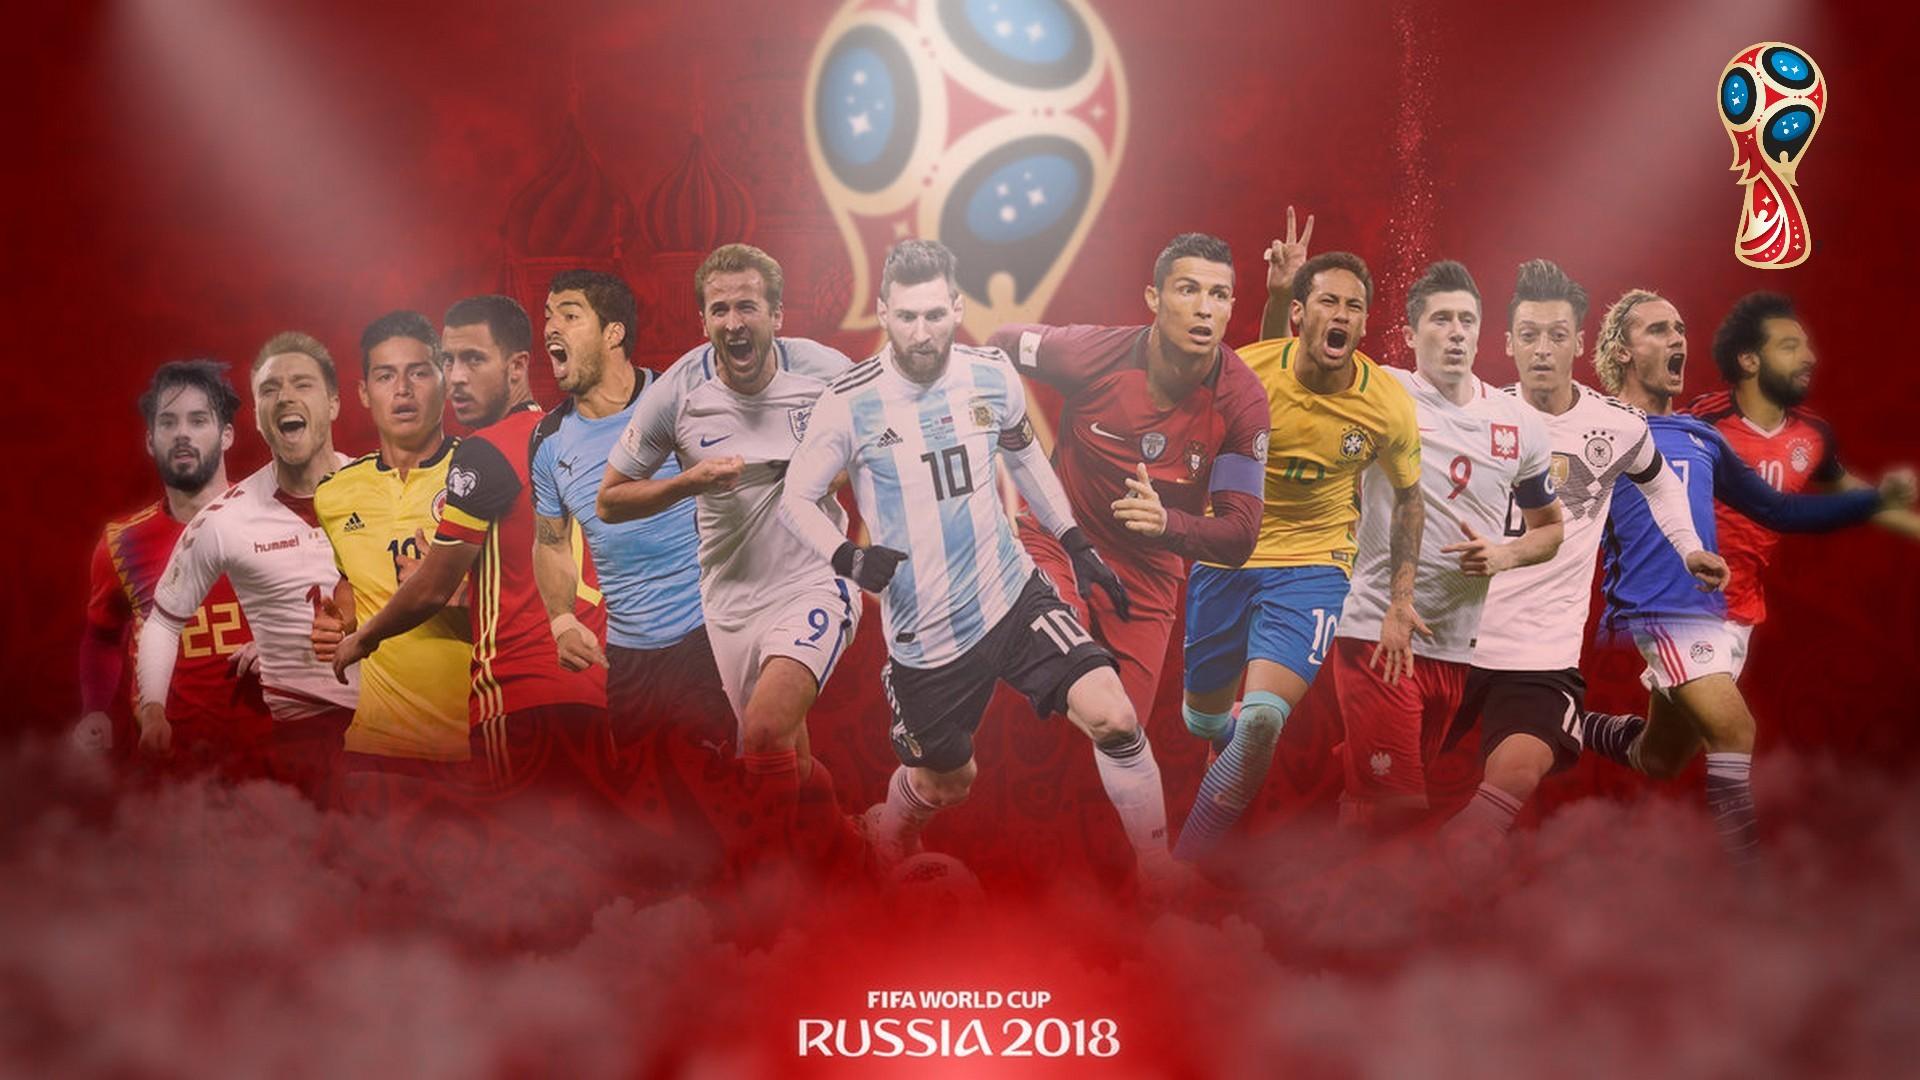 FIFA World Cup Wallpaper 2021 Football Wallpaper 1920x1080